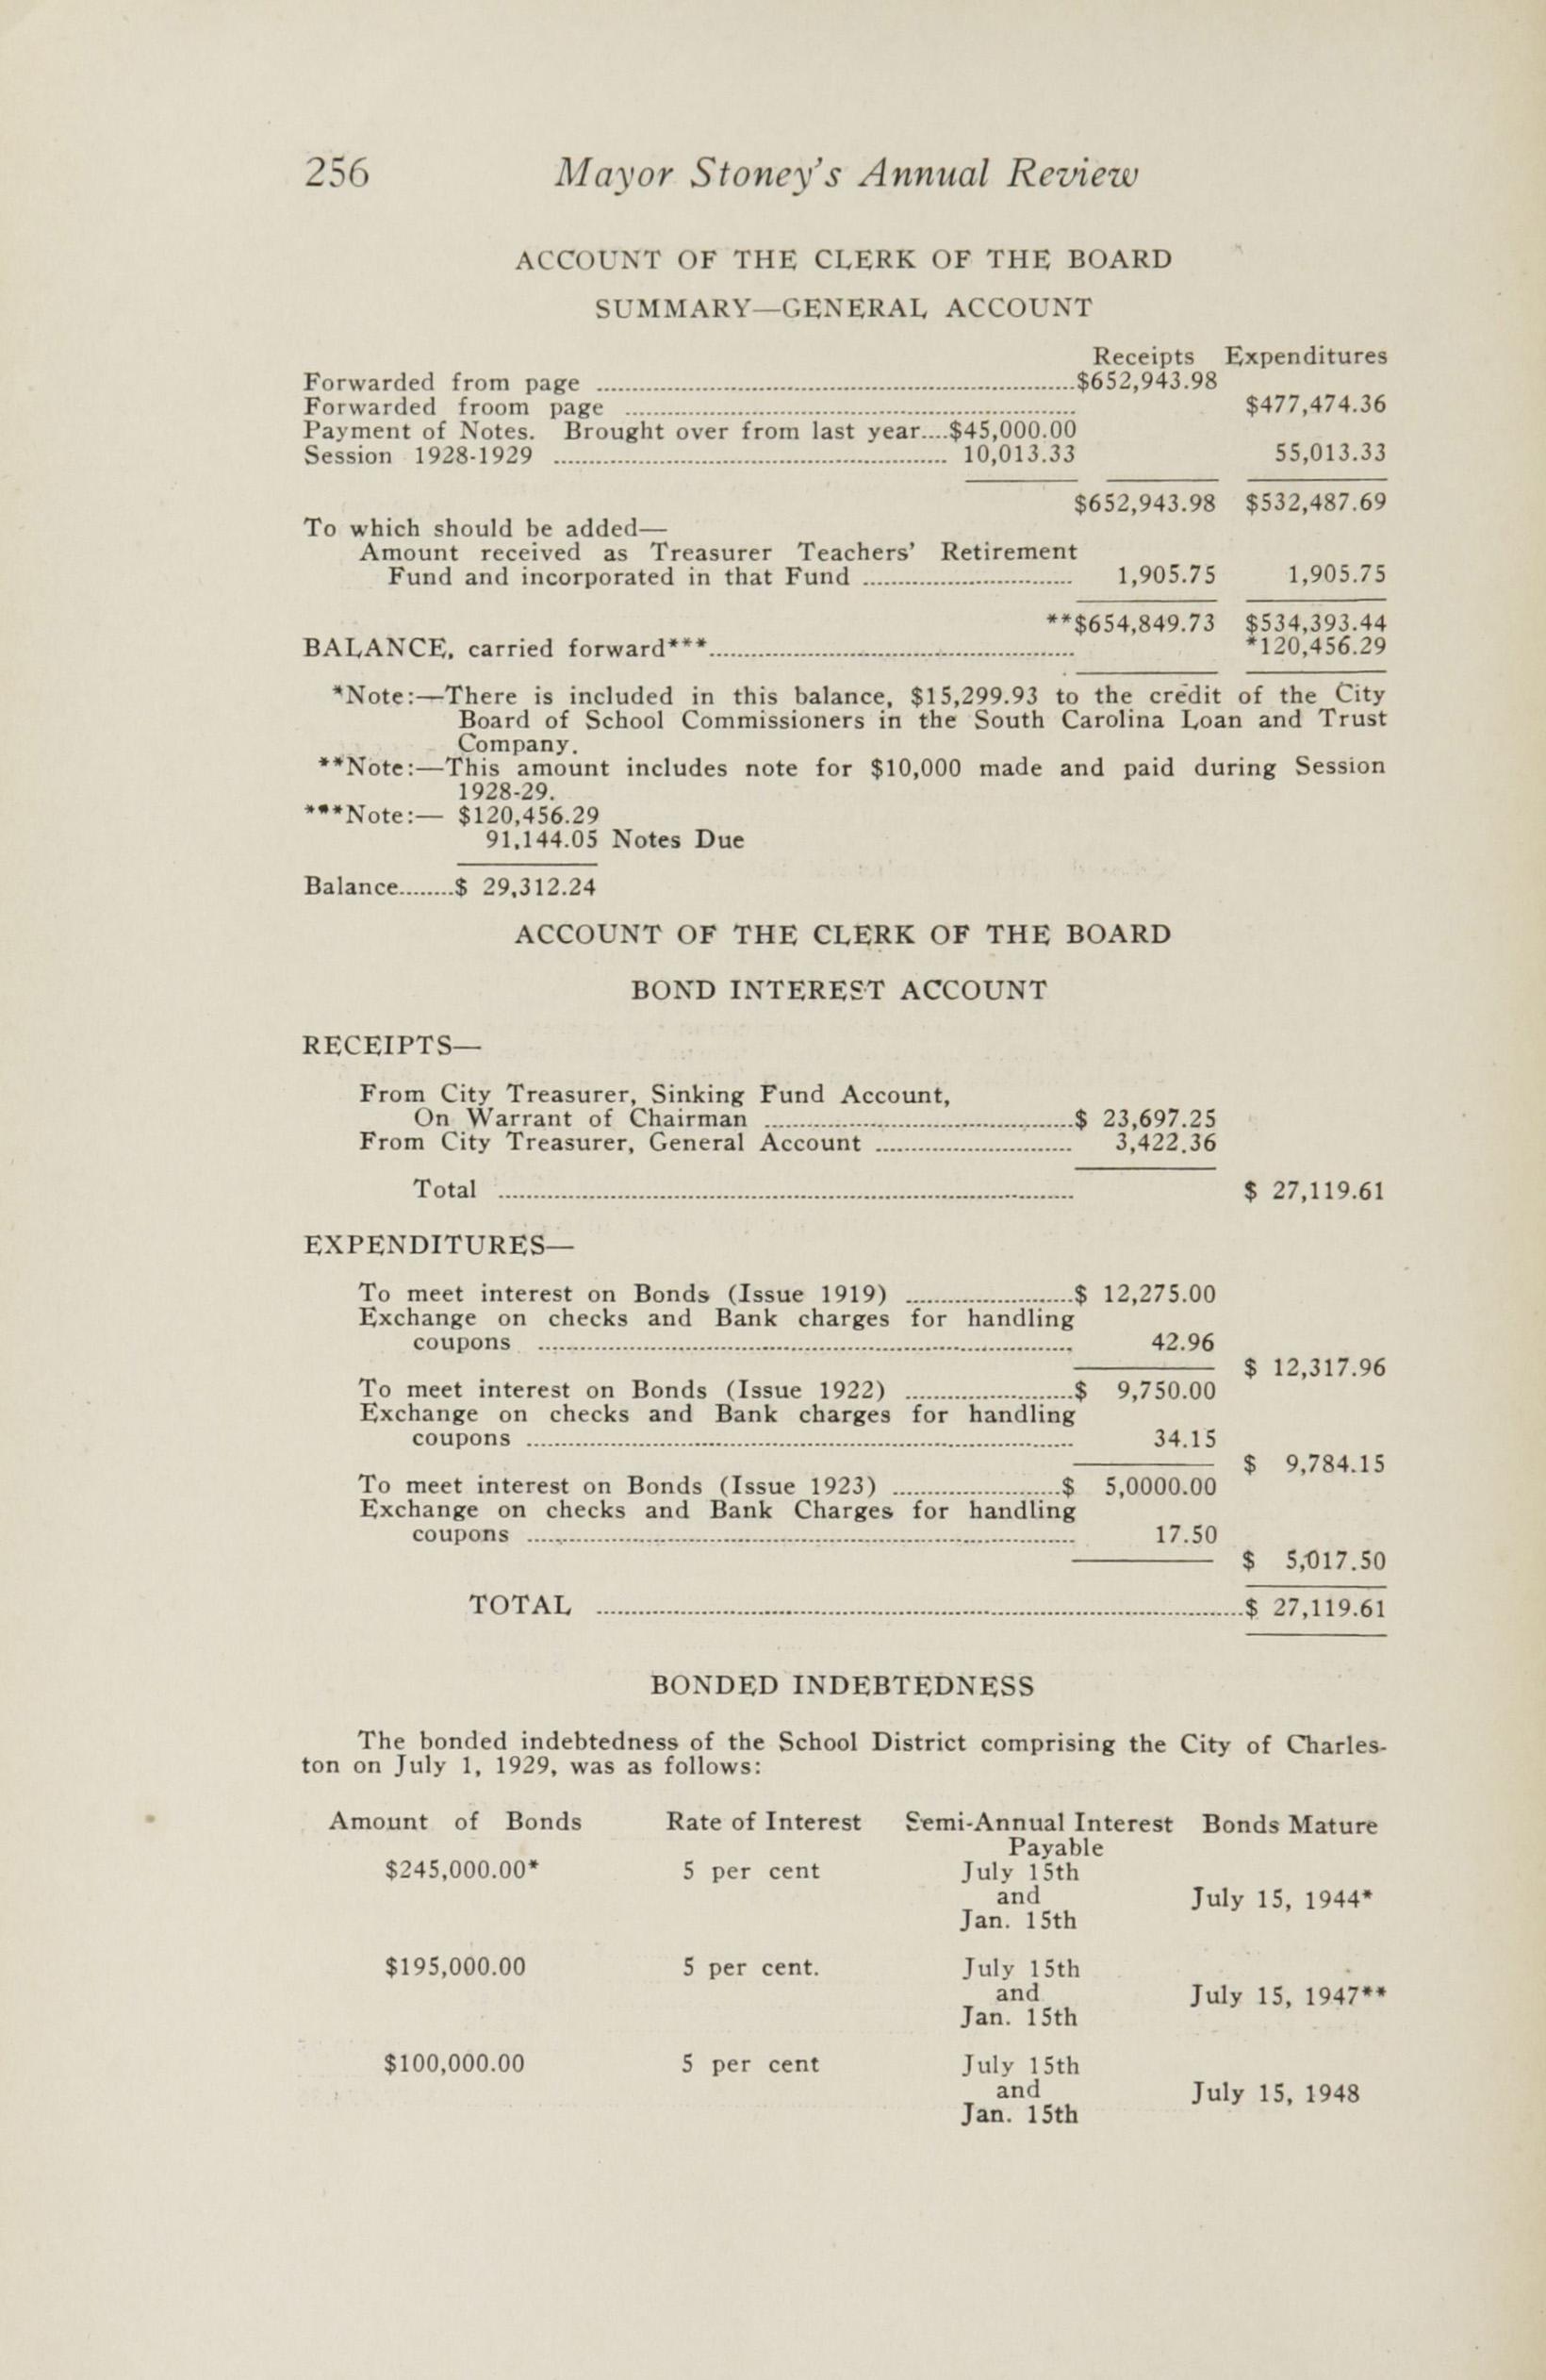 Charleston Yearbook, 1929, page 256